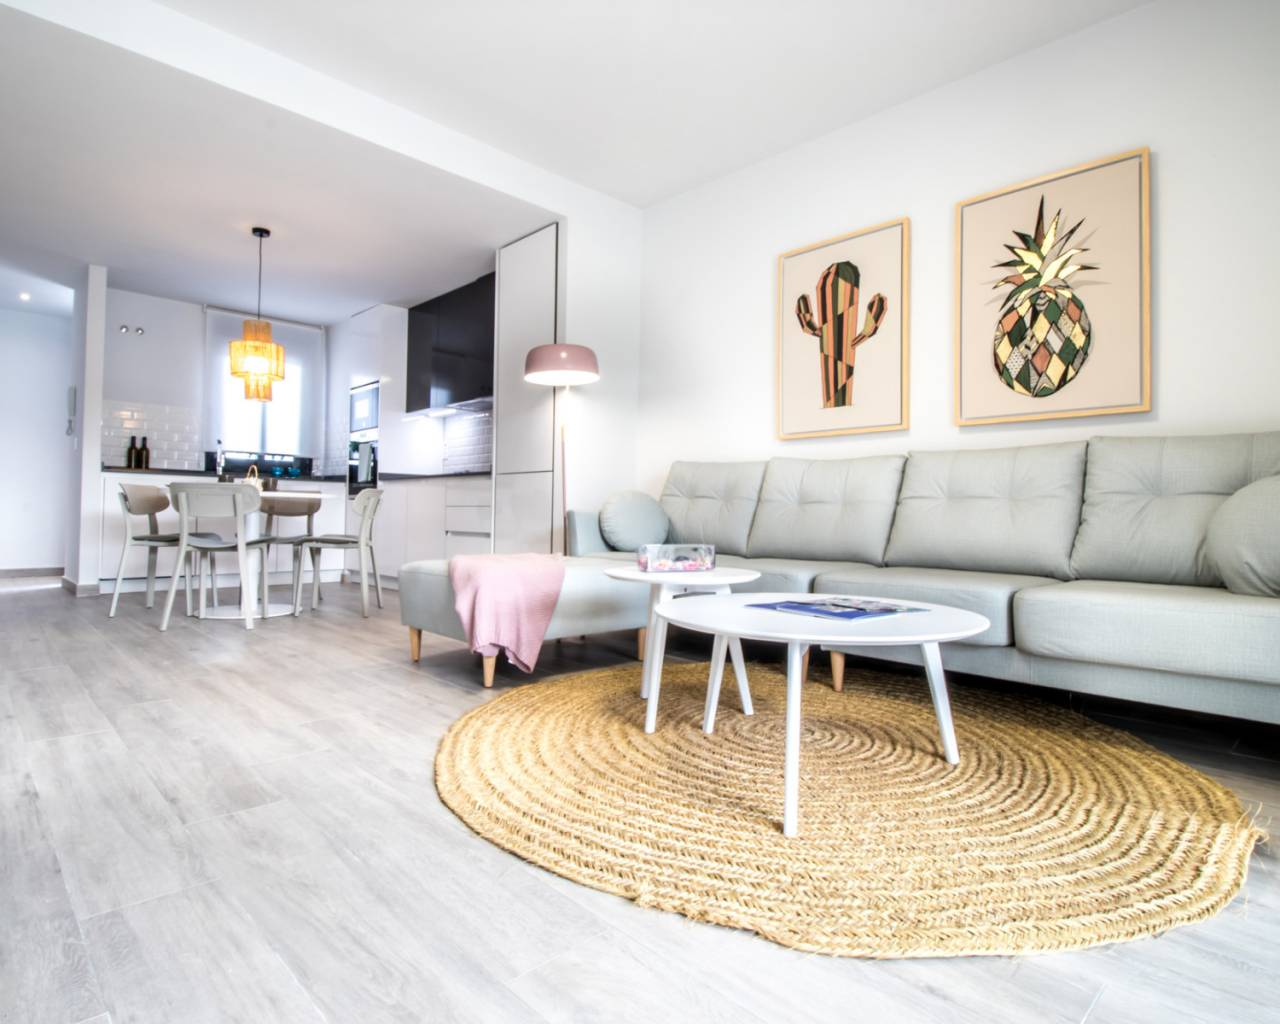 nieuwbouw-appartement-san-miguel-de-salinas_1788_xl